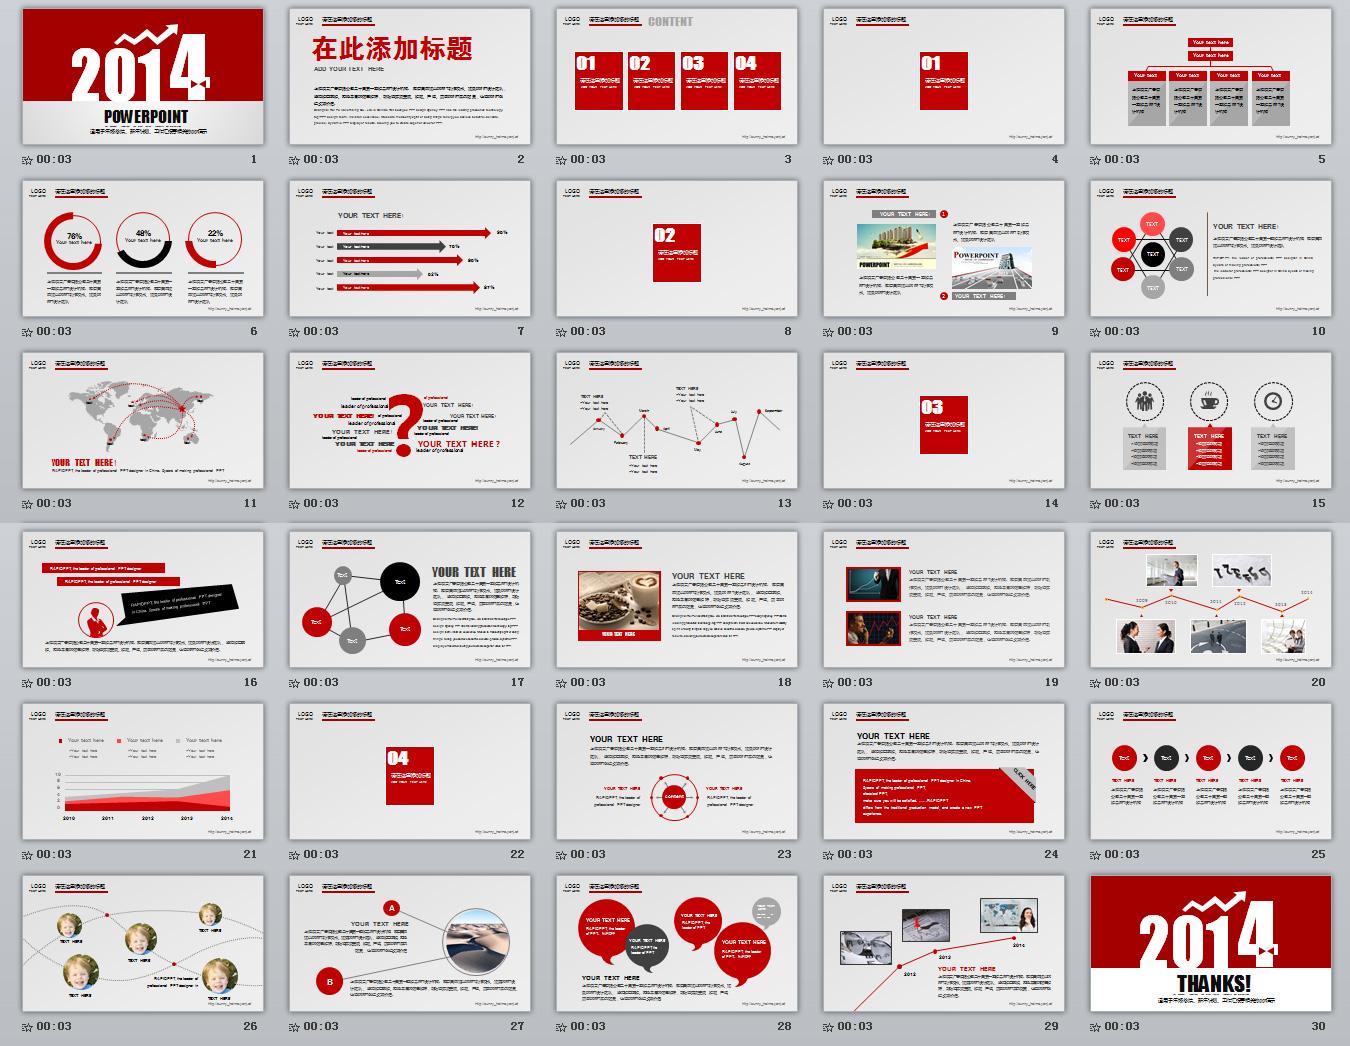 2014年度总结ppt模板